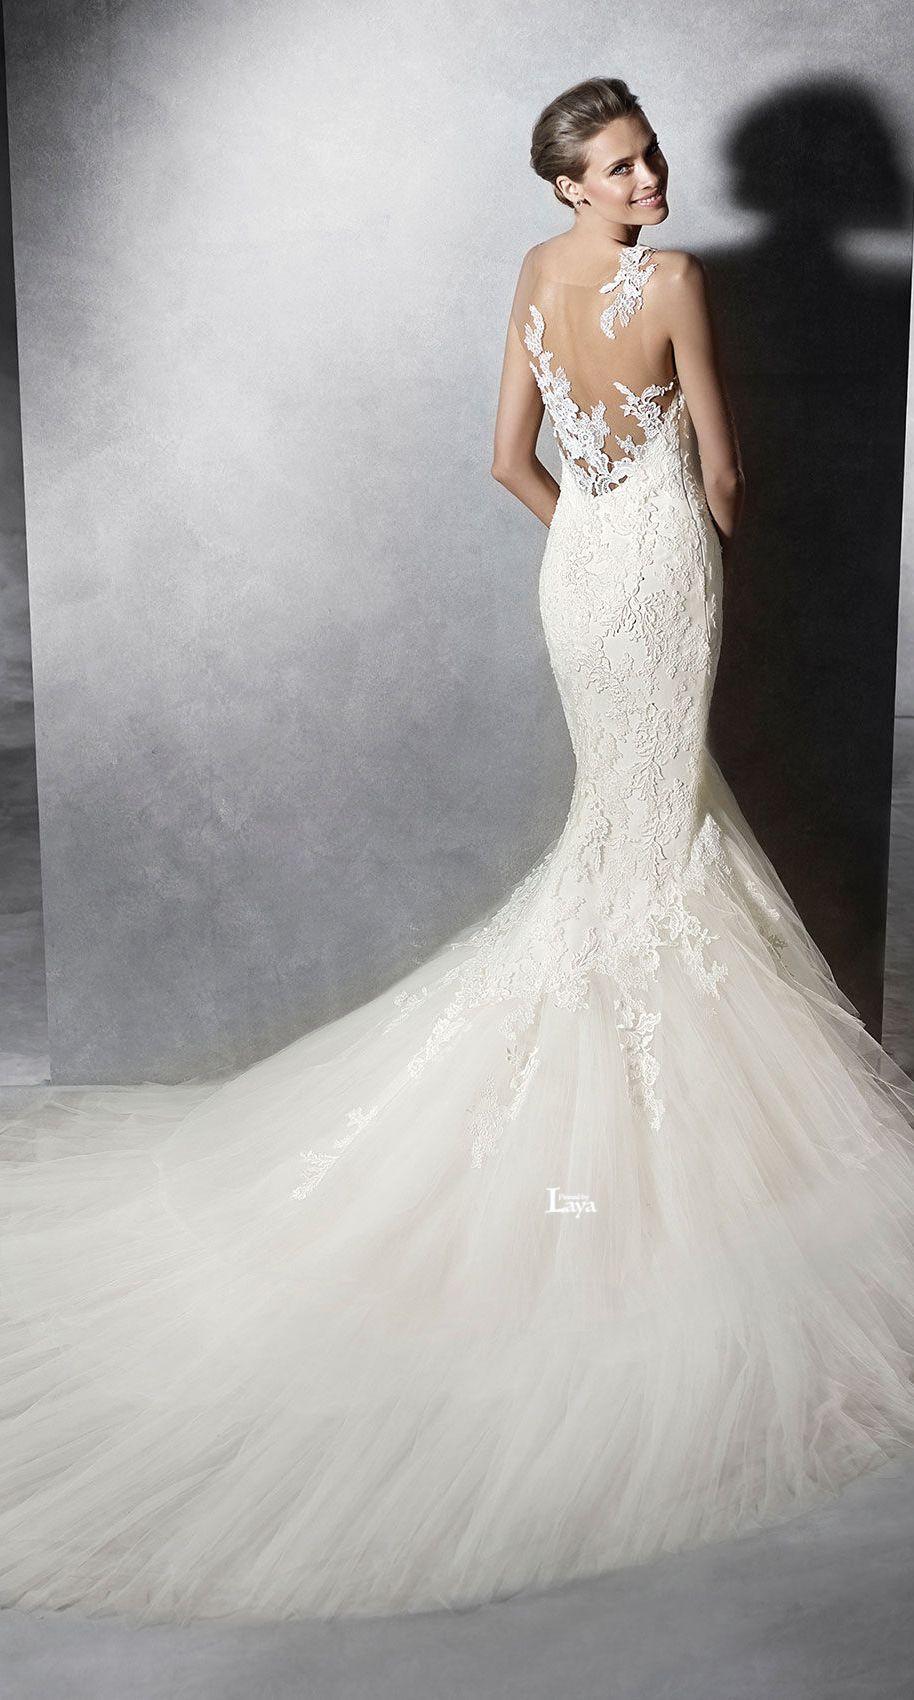 Dresses for summer wedding reception  LAYAAVANCE PRONOVIAS  BRIDAL  Daughters Wedding